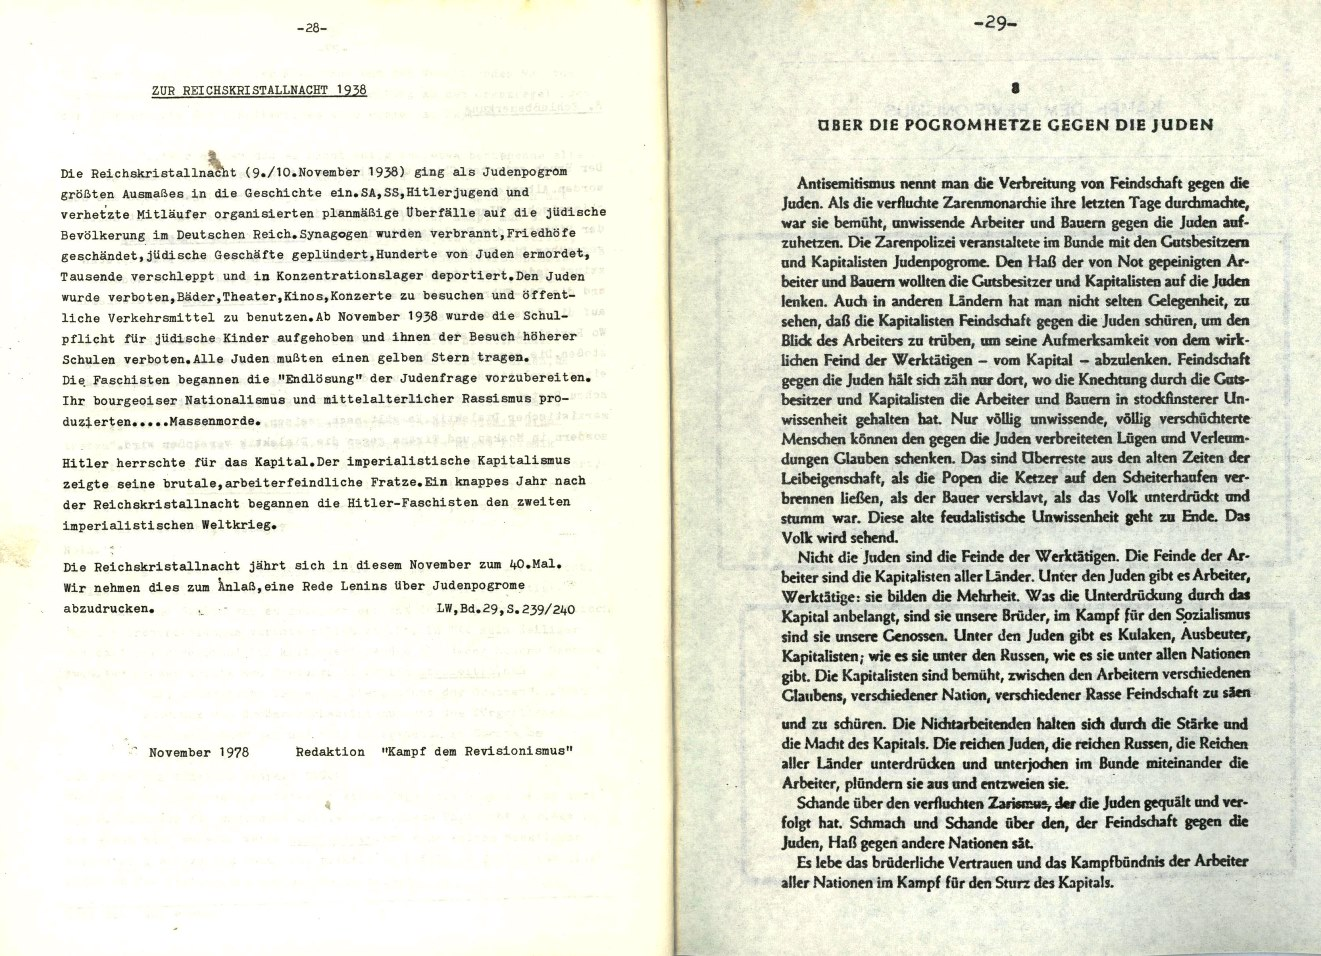 Muenchen_Kampf_dem_Revisionismus_1978_08_15